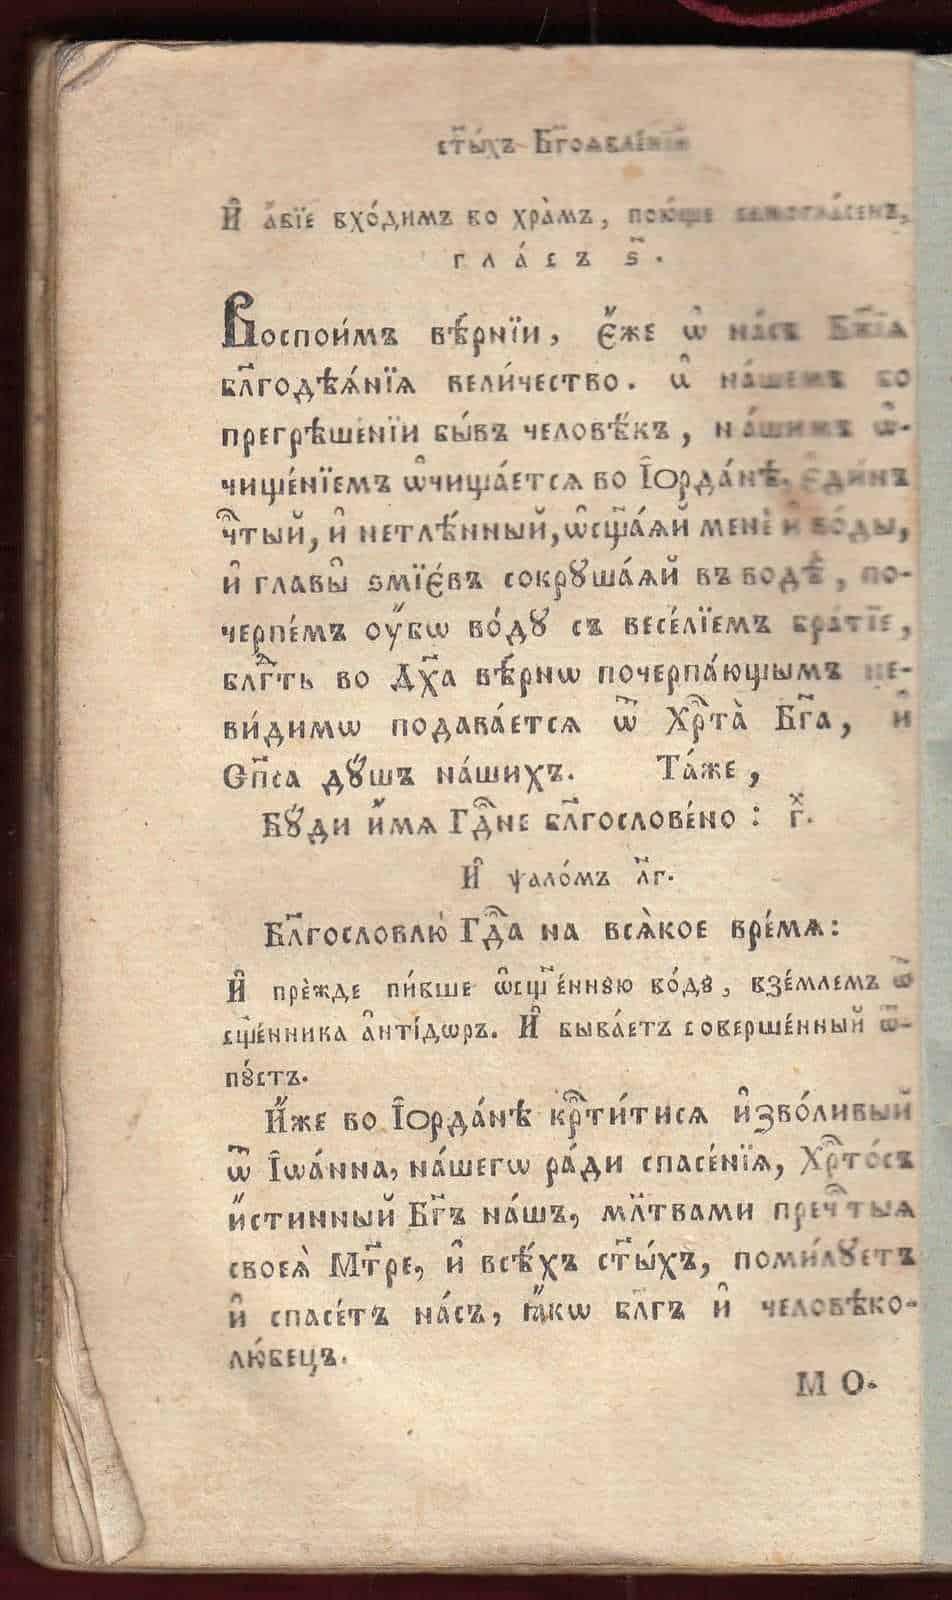 19c-Posledovanie-Acolouthia-e-Old-Slavonic-Inscribed-Manuscript-401146479031-8